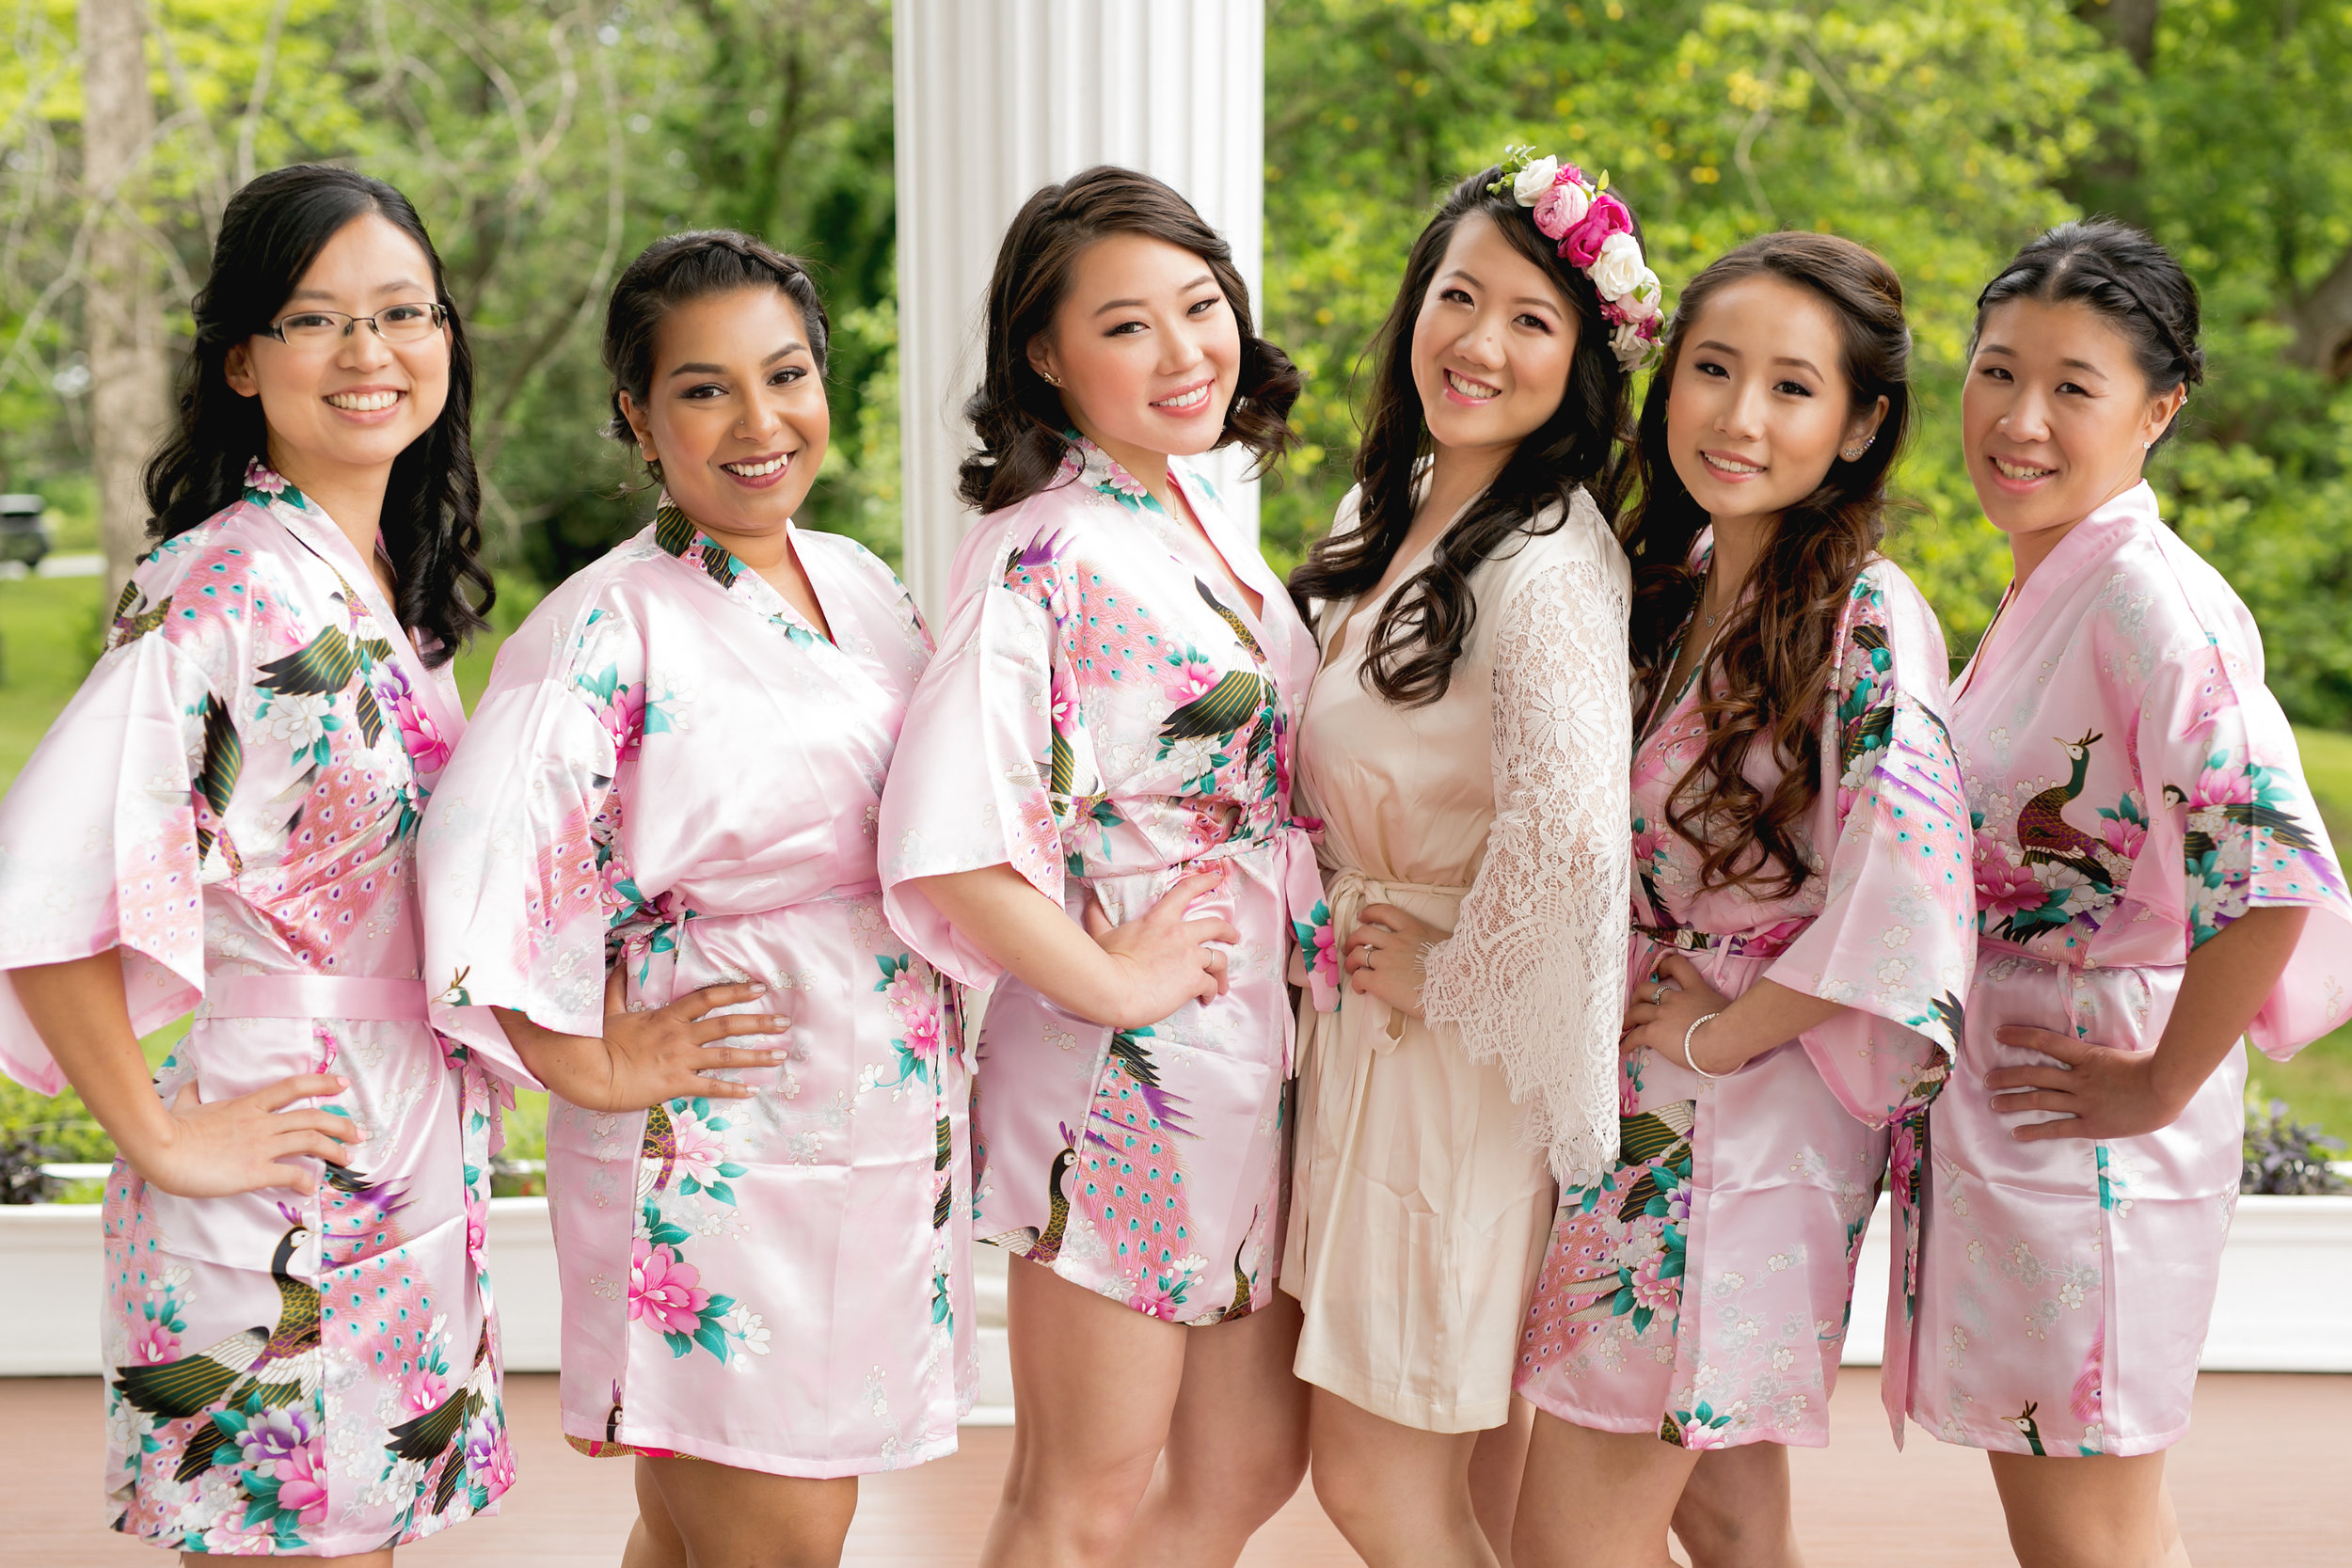 Bridesmaids robes